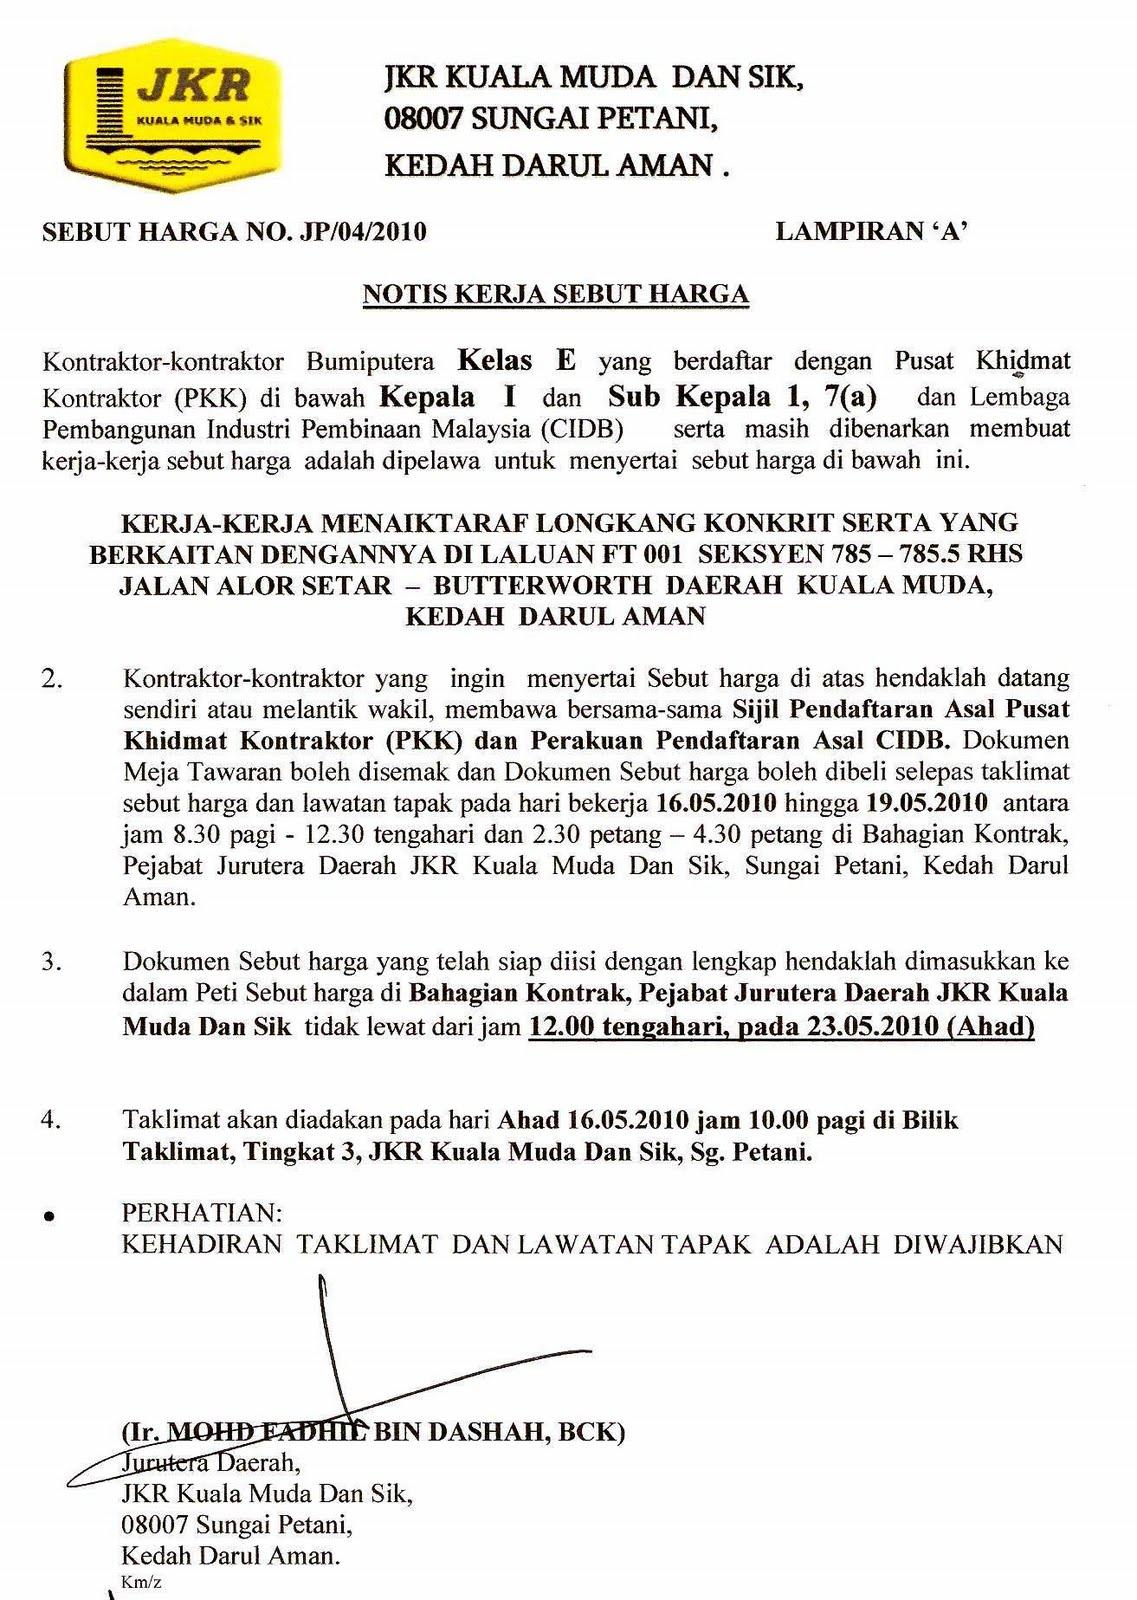 Jabatan Kerja Raya Daerah Kuala Muda Dan Sik Sebut Harga Untuk Kontraktor Kelas E